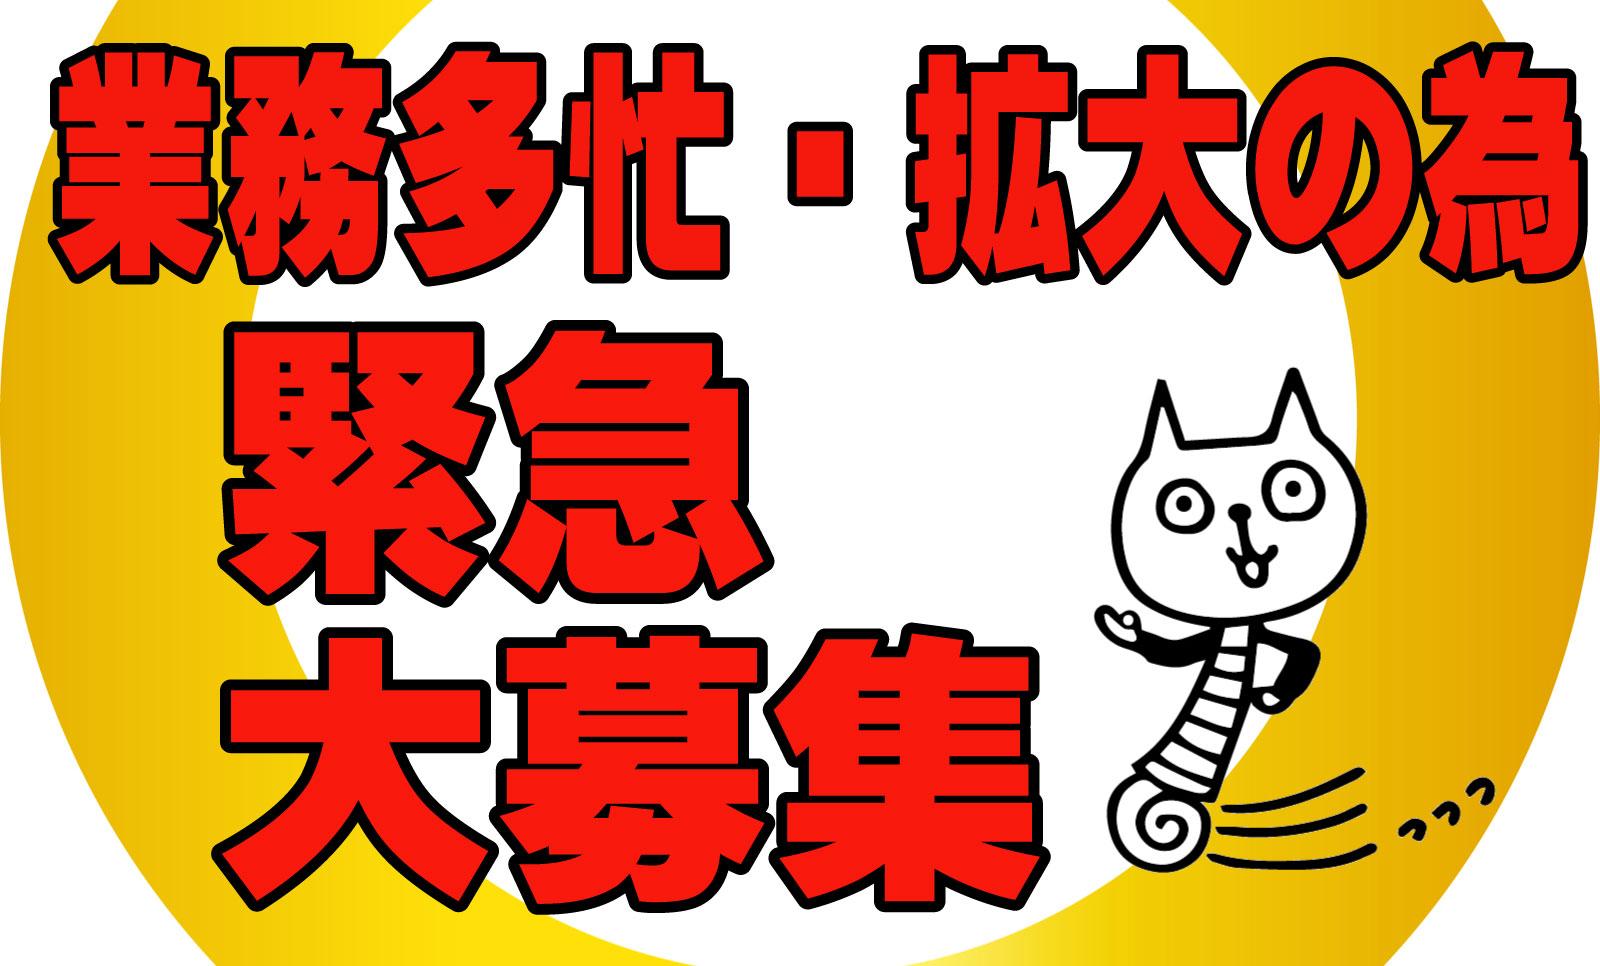 ★横浜支社★業務多忙・拡大の為、緊急募集★工事現場での交通誘導